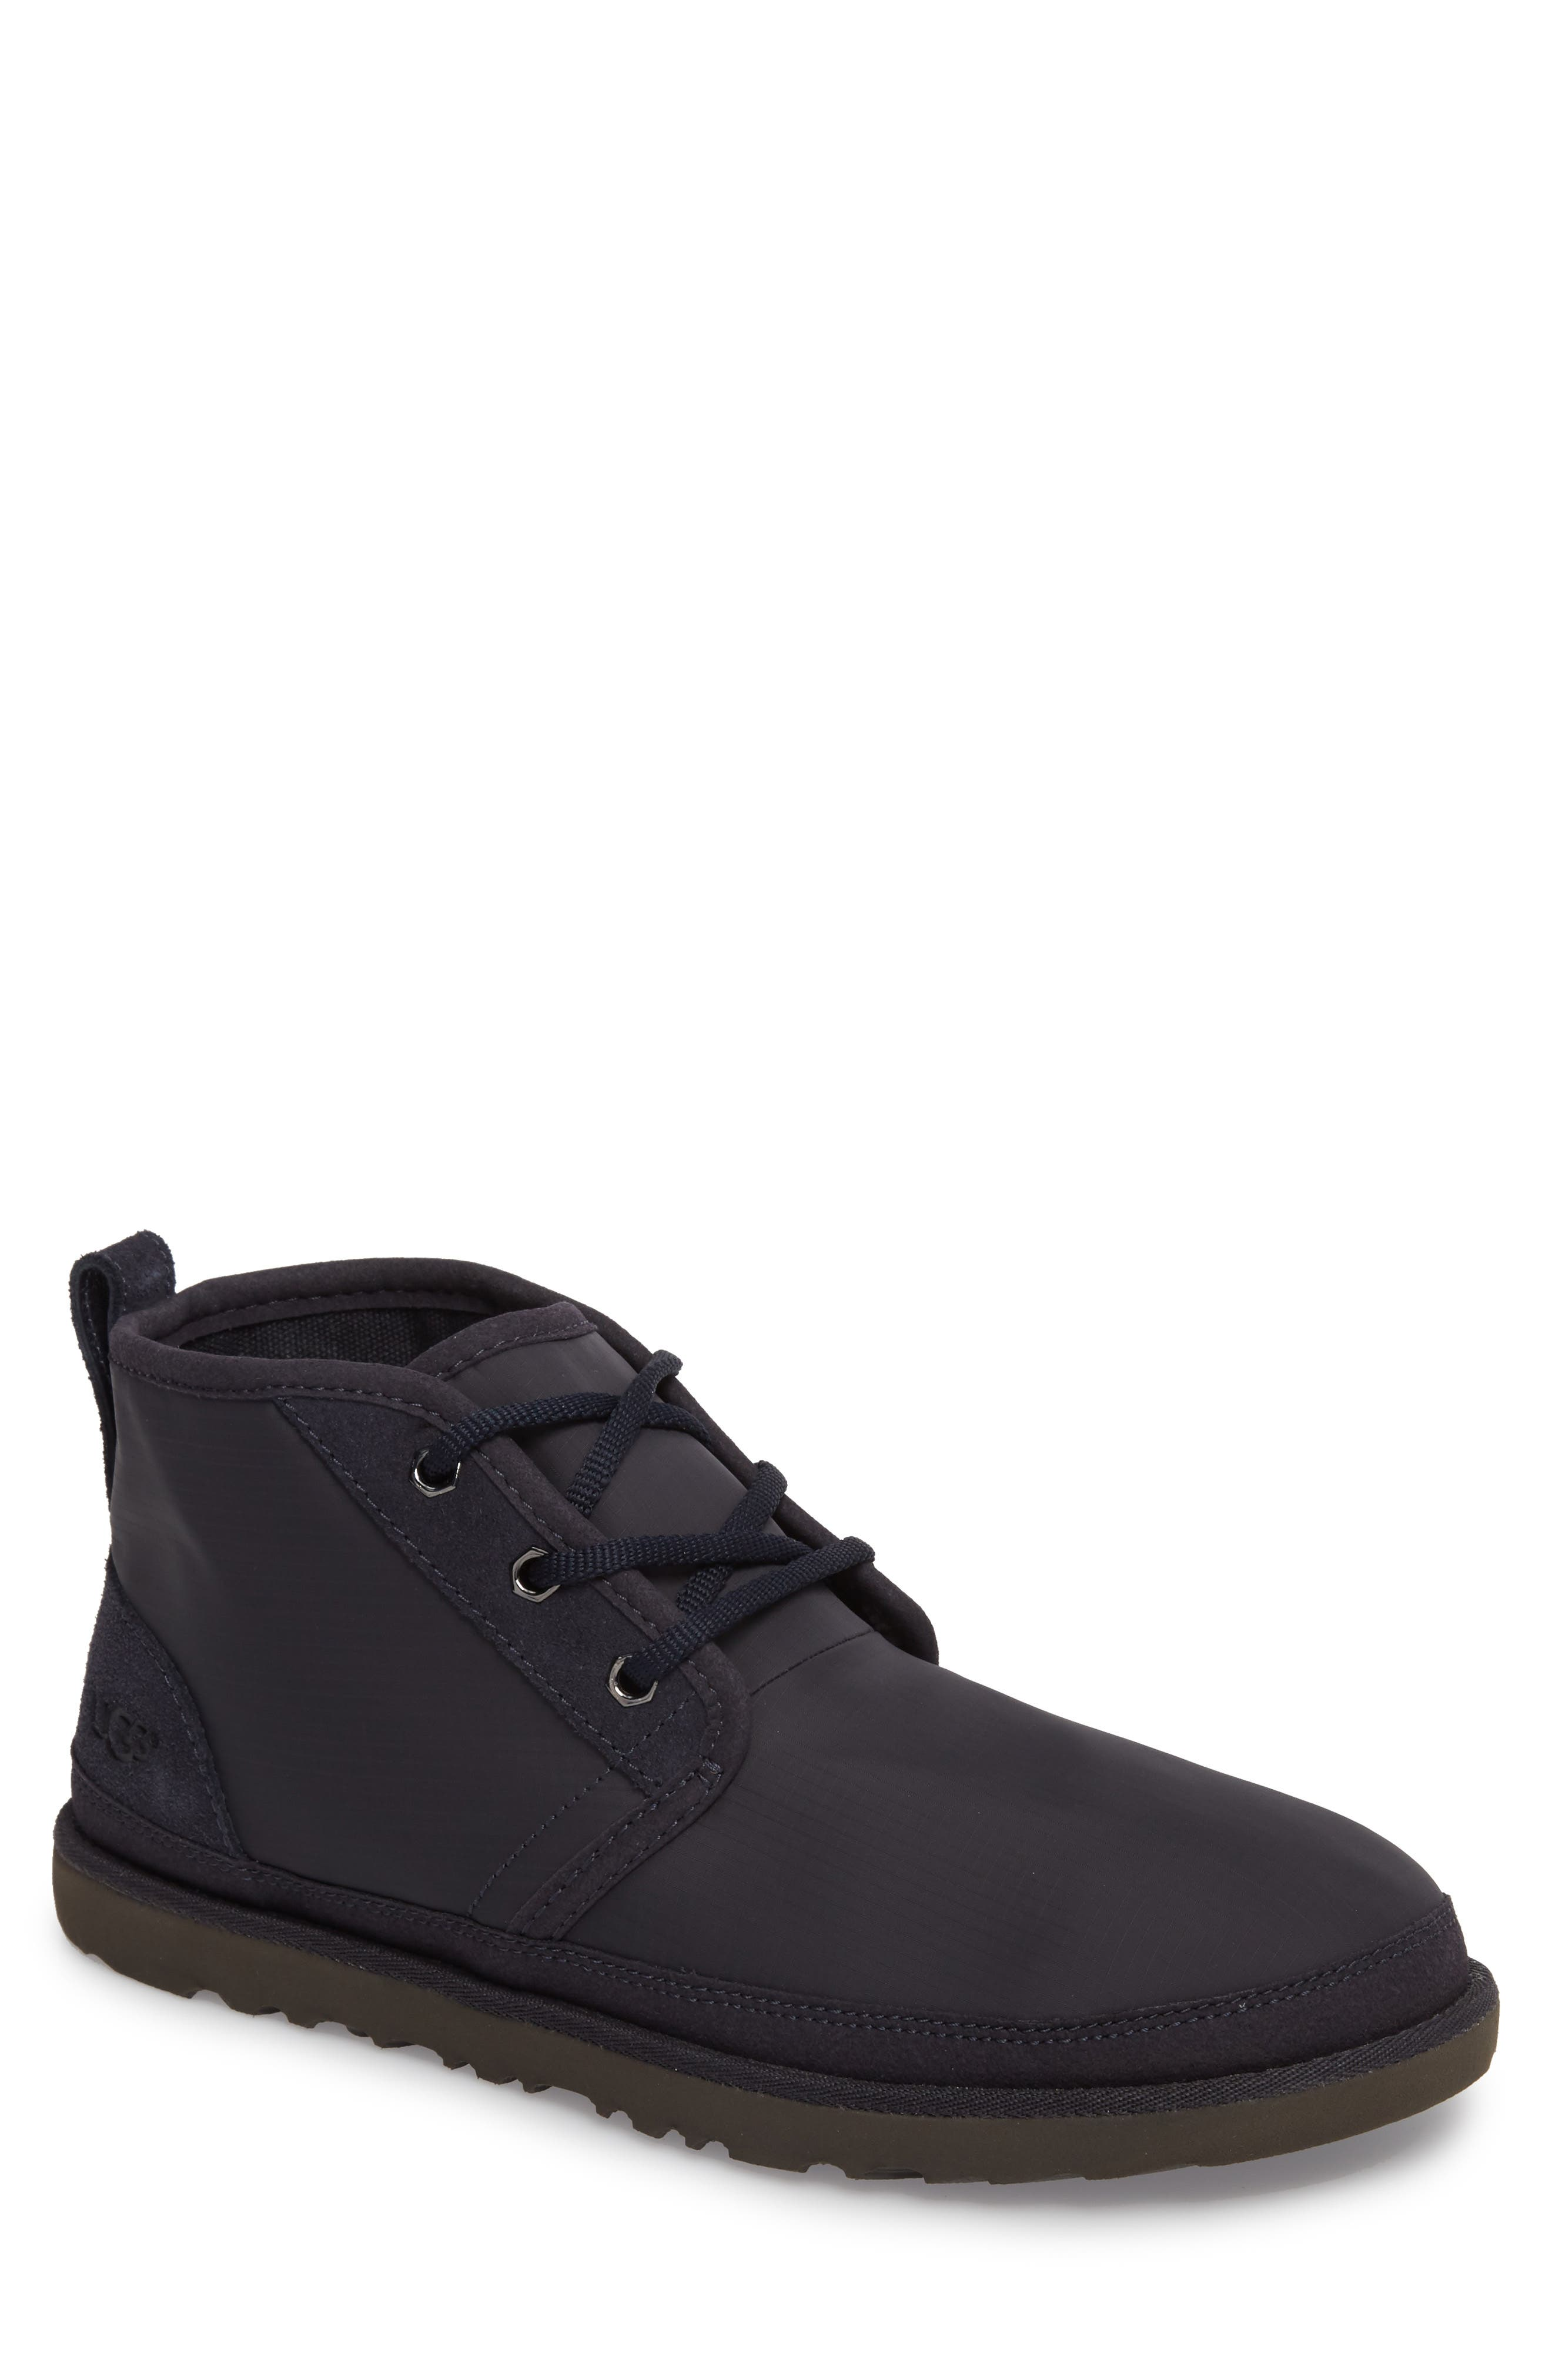 Neumel Ripstop Chukka Boot,                         Main,                         color, True Navy Leather